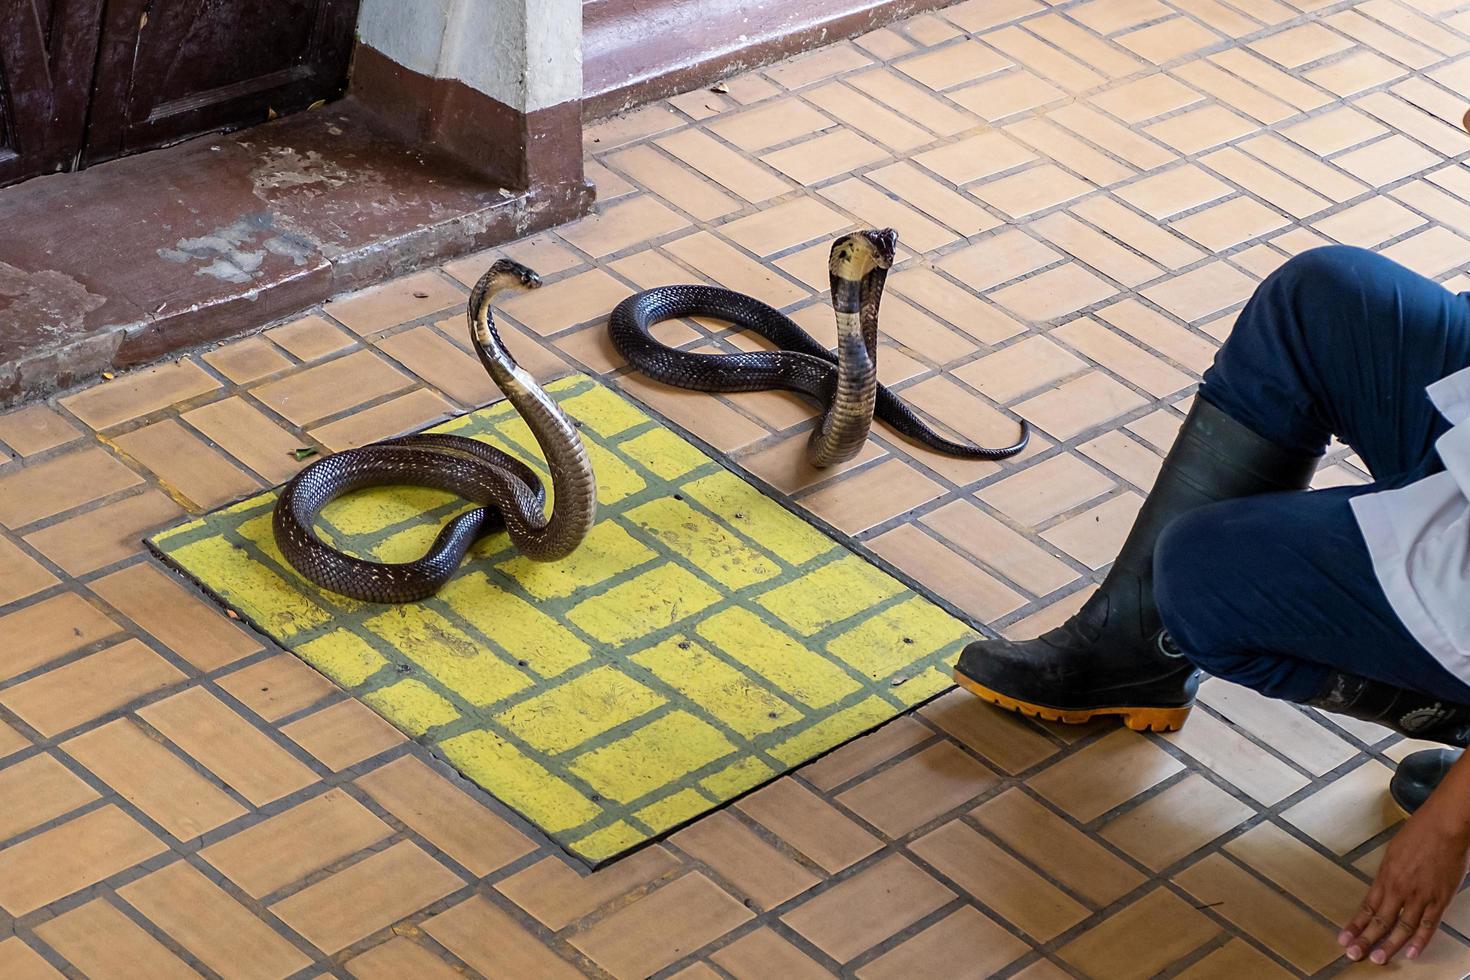 Snake handling demonstration fighting with two cobras, Bangkok, Thailand photo